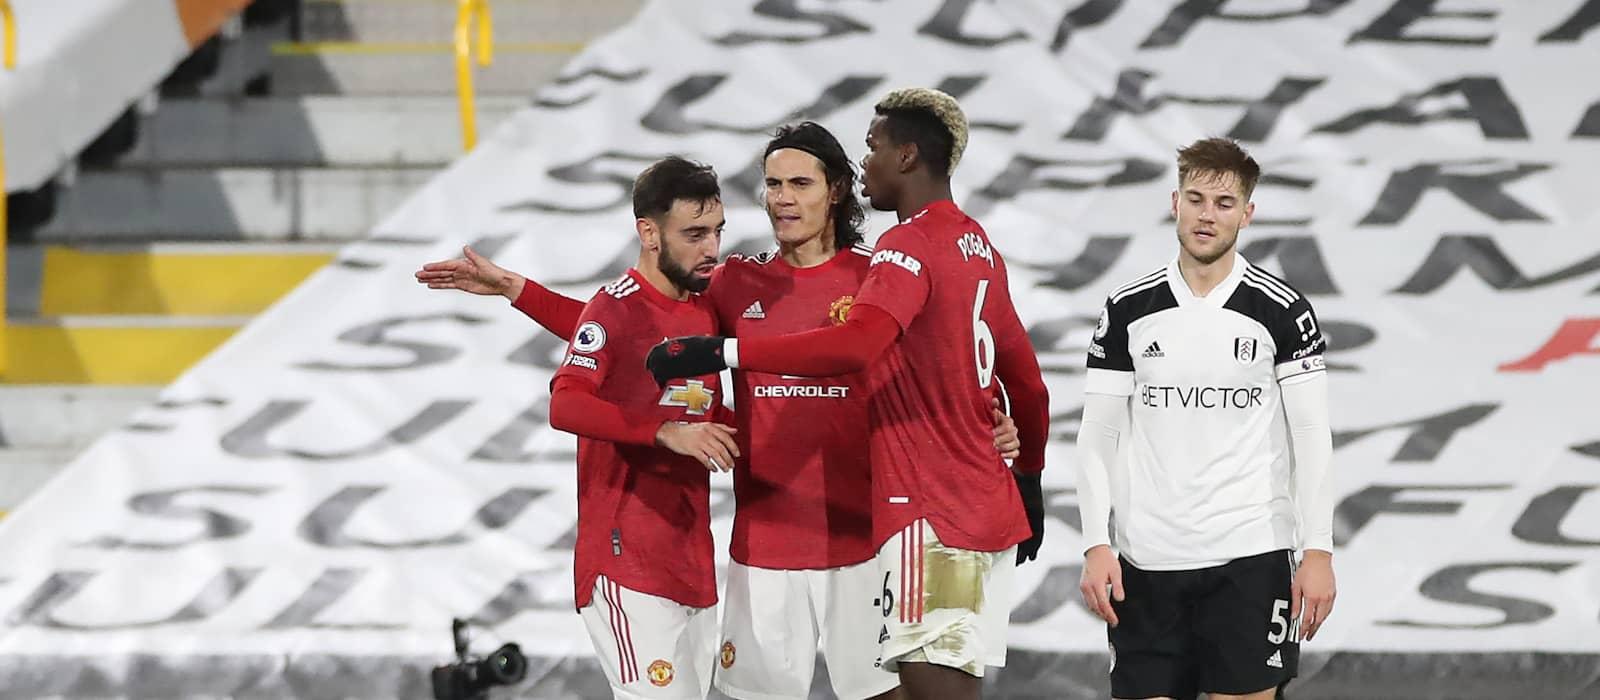 Paul Pogba dismantles Fulham in match-winning performance